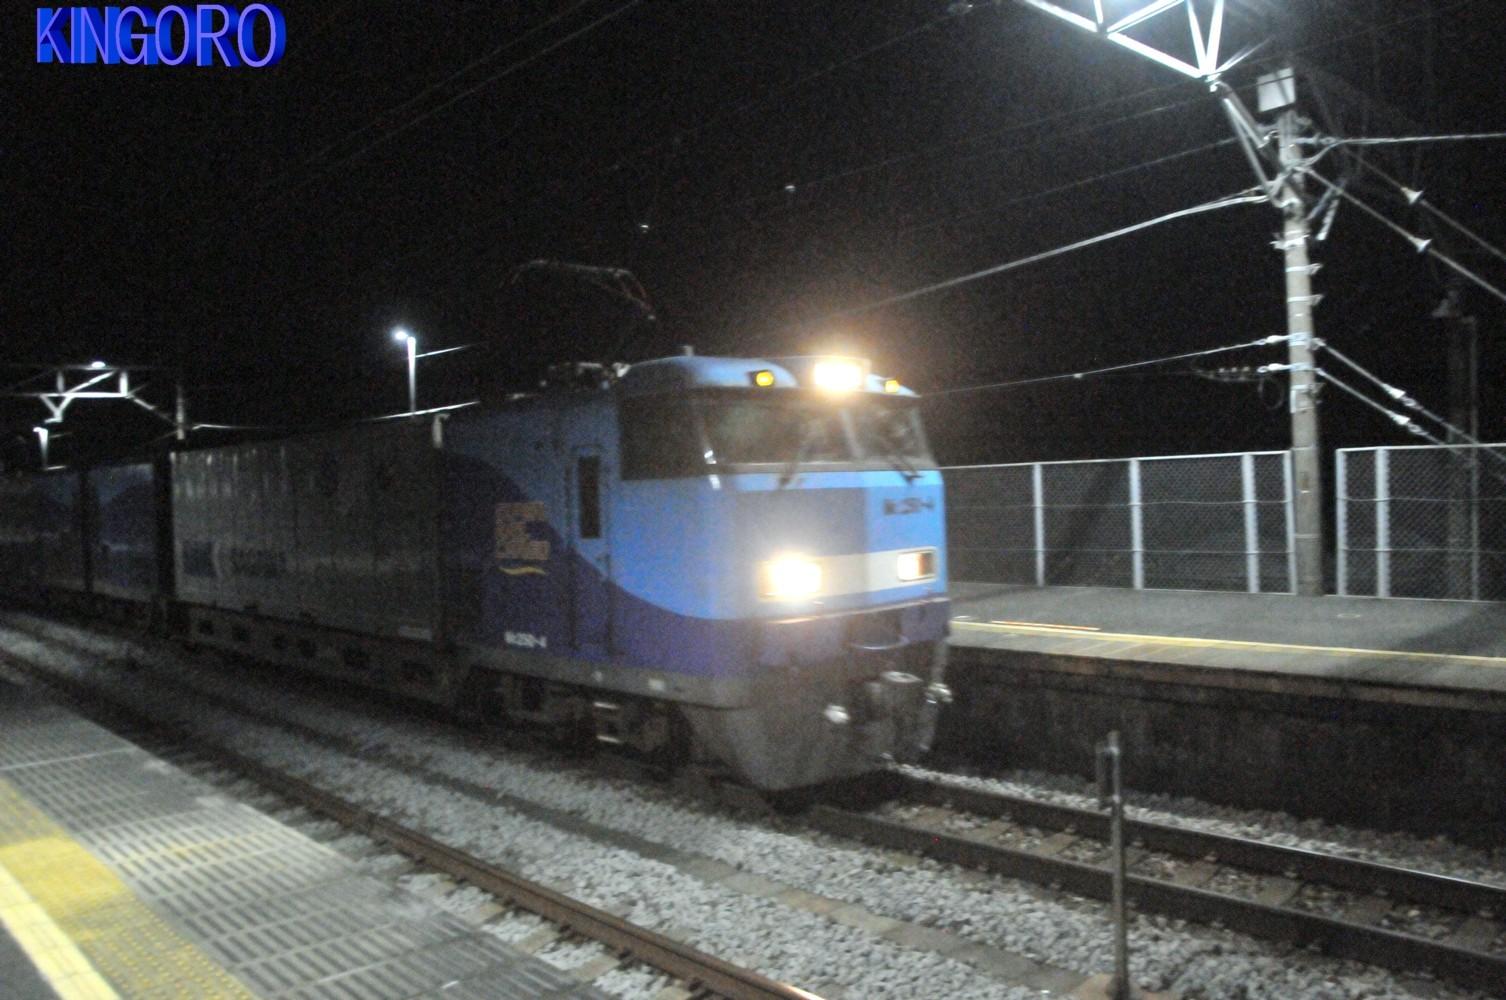 DSC_8556_20210911_001654.jpg